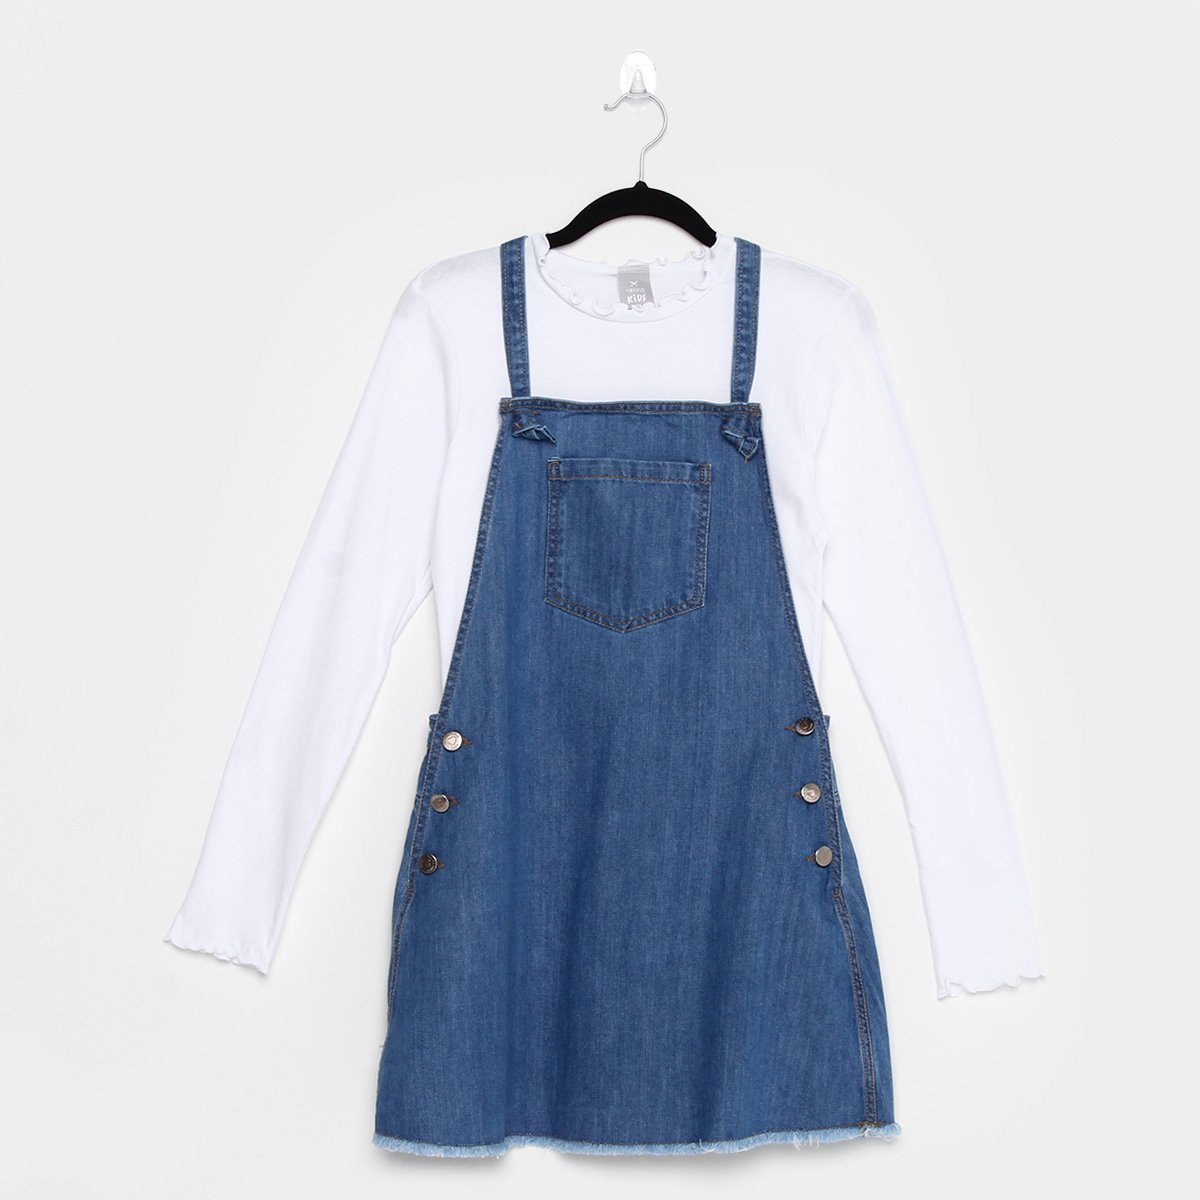 Conjunto Infantil Hering Salopete Jeans Feminino